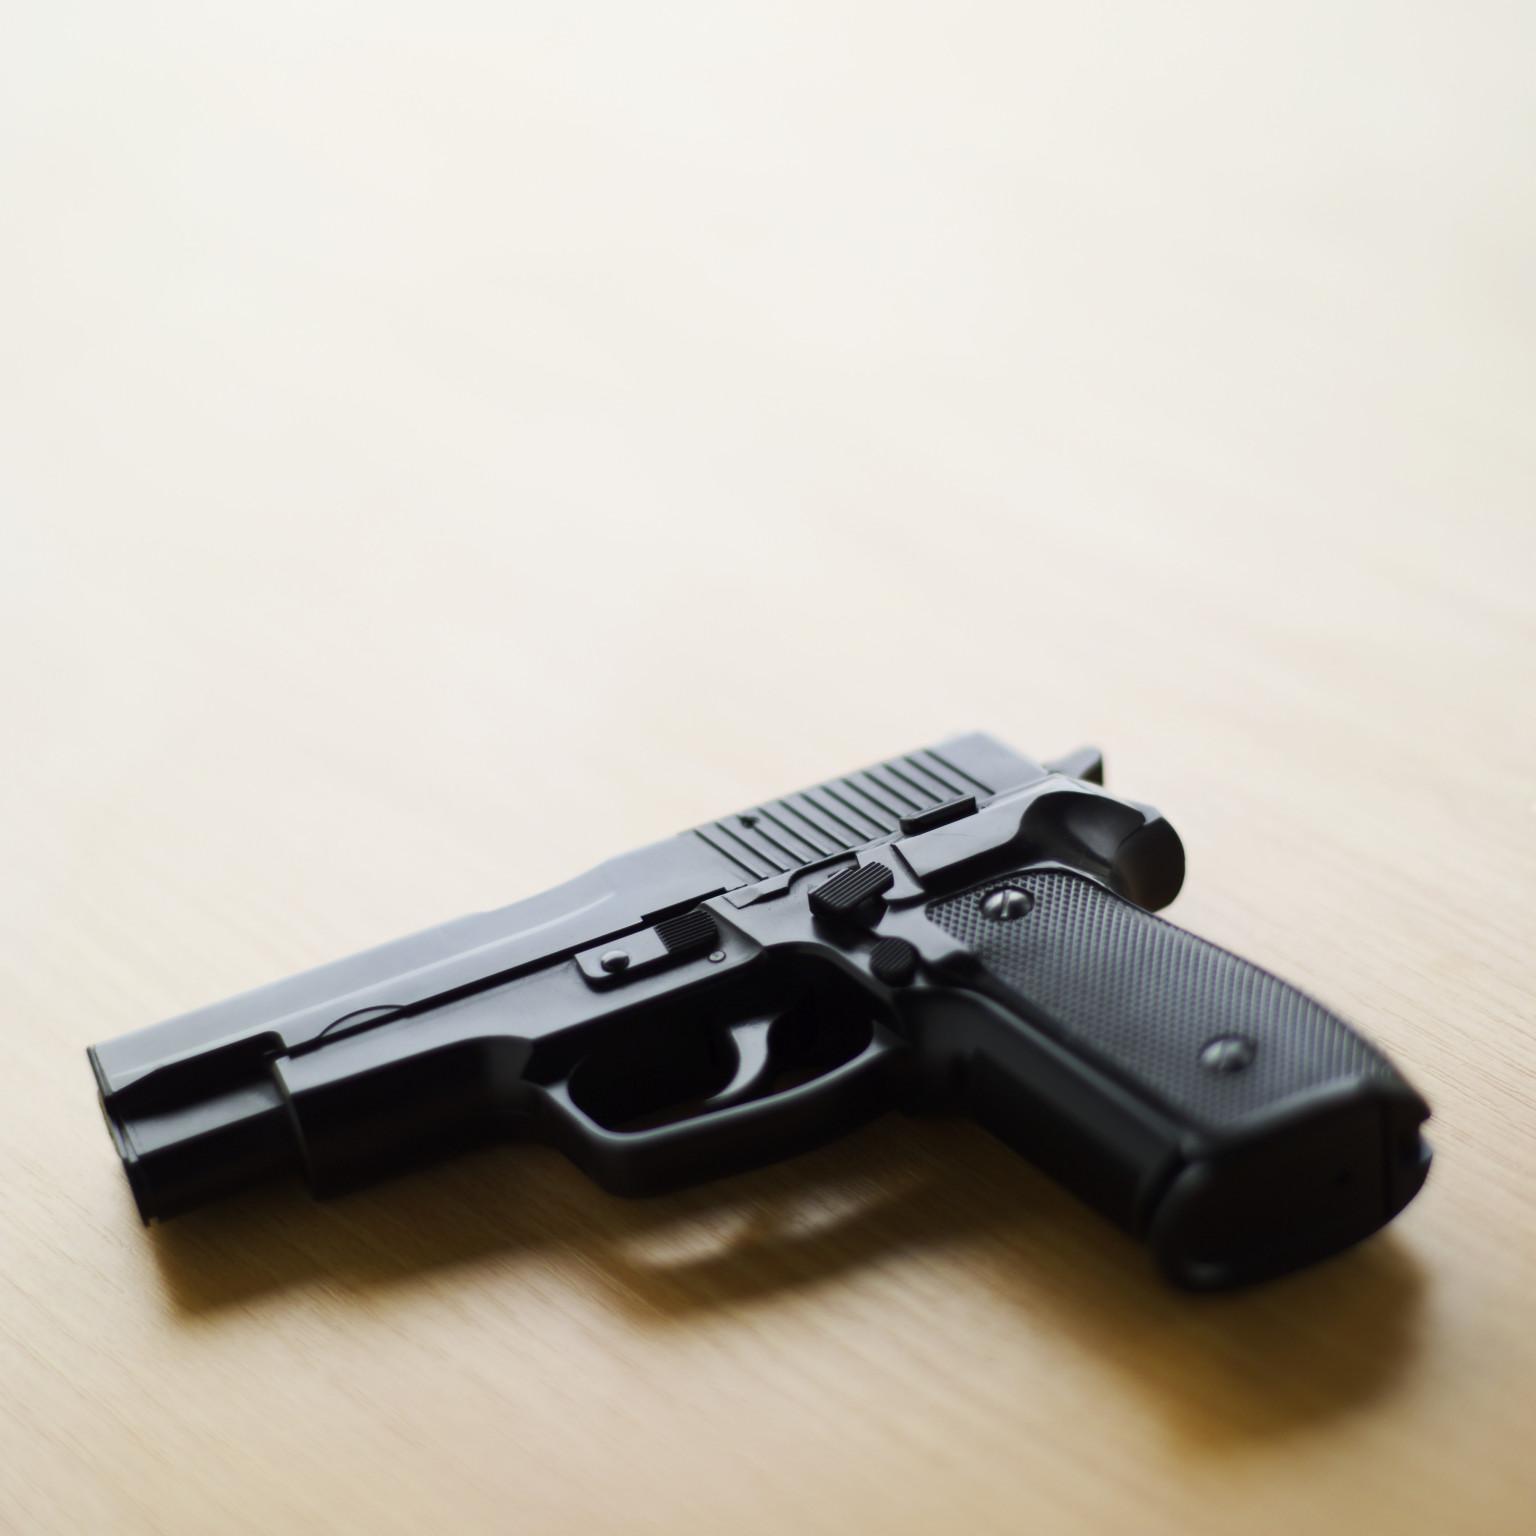 expanding gun control background checks has